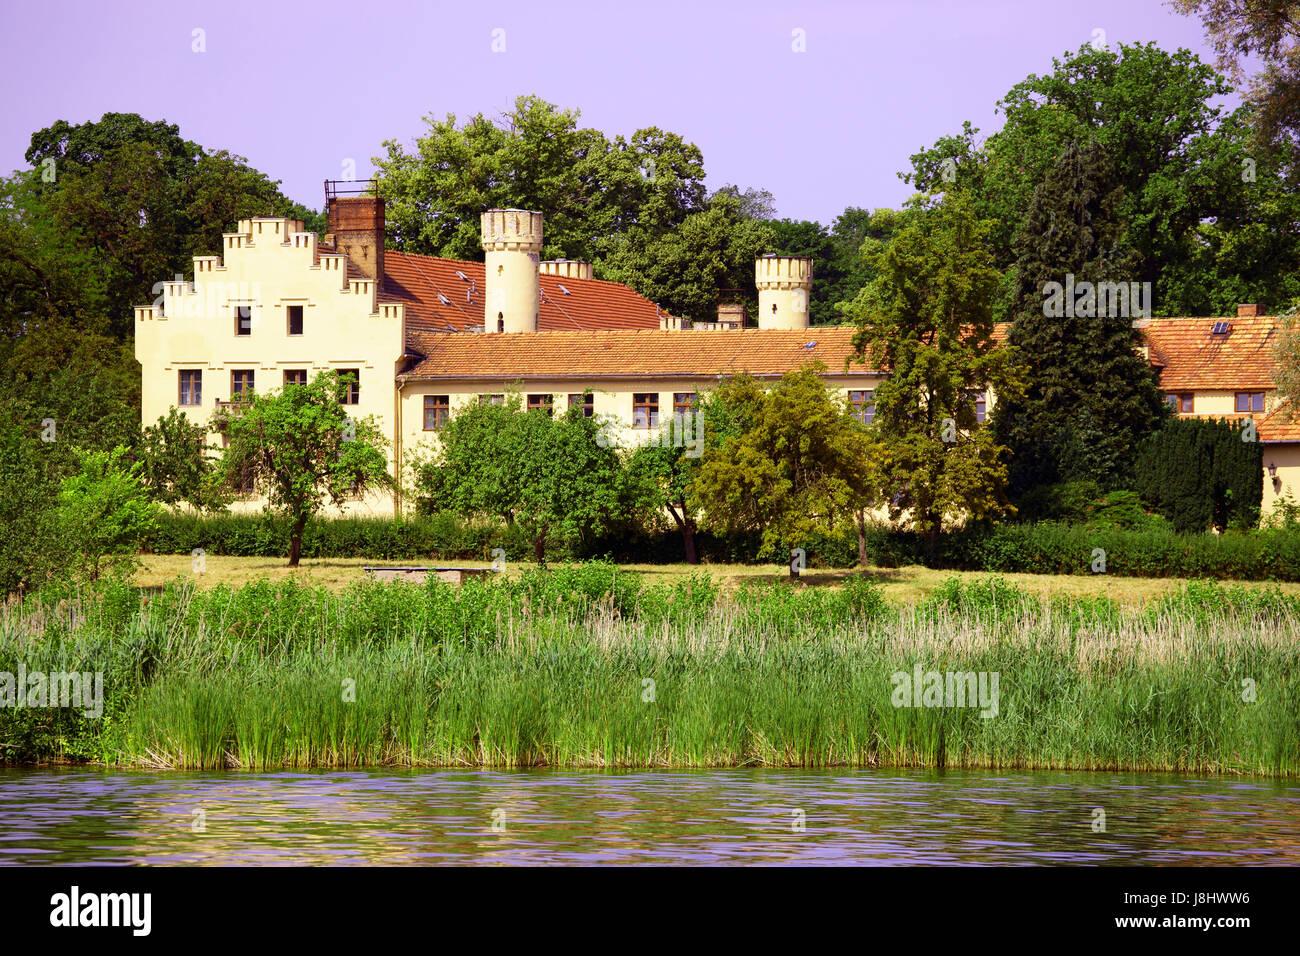 idyll, luxury hotel, nature, brandenburg, germany, german federal republic, Stock Photo